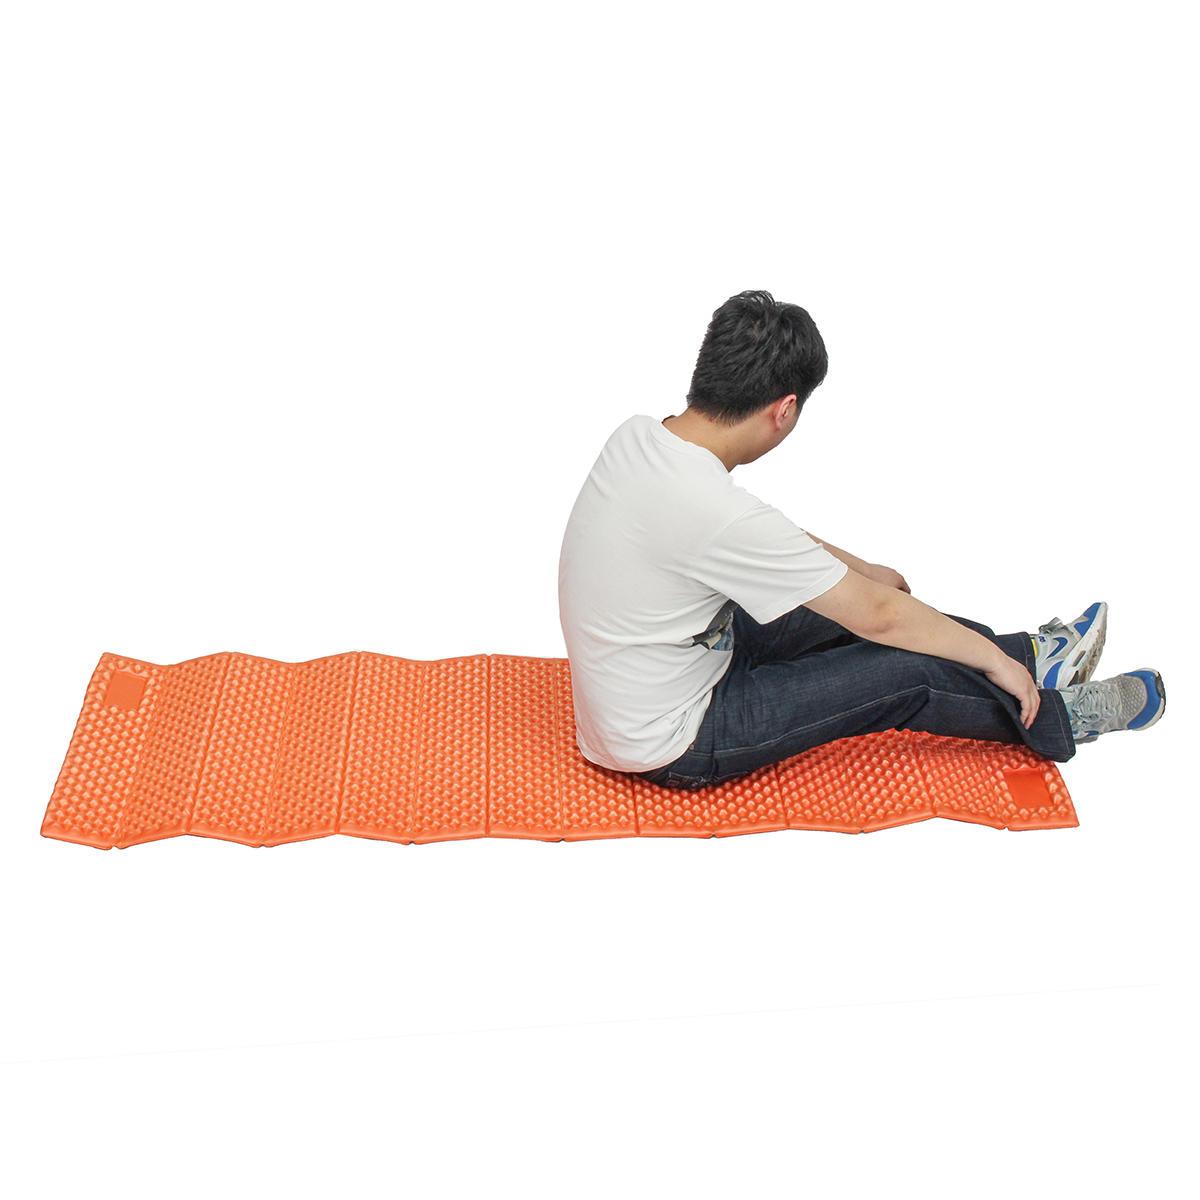 22.4x72inch Airtrack Yoga Mats Portable Ultralight Indoor Outdoor Camping Beach Sleeping Mat Picnic Moistureproof Folding Egg Slot Pad Bed